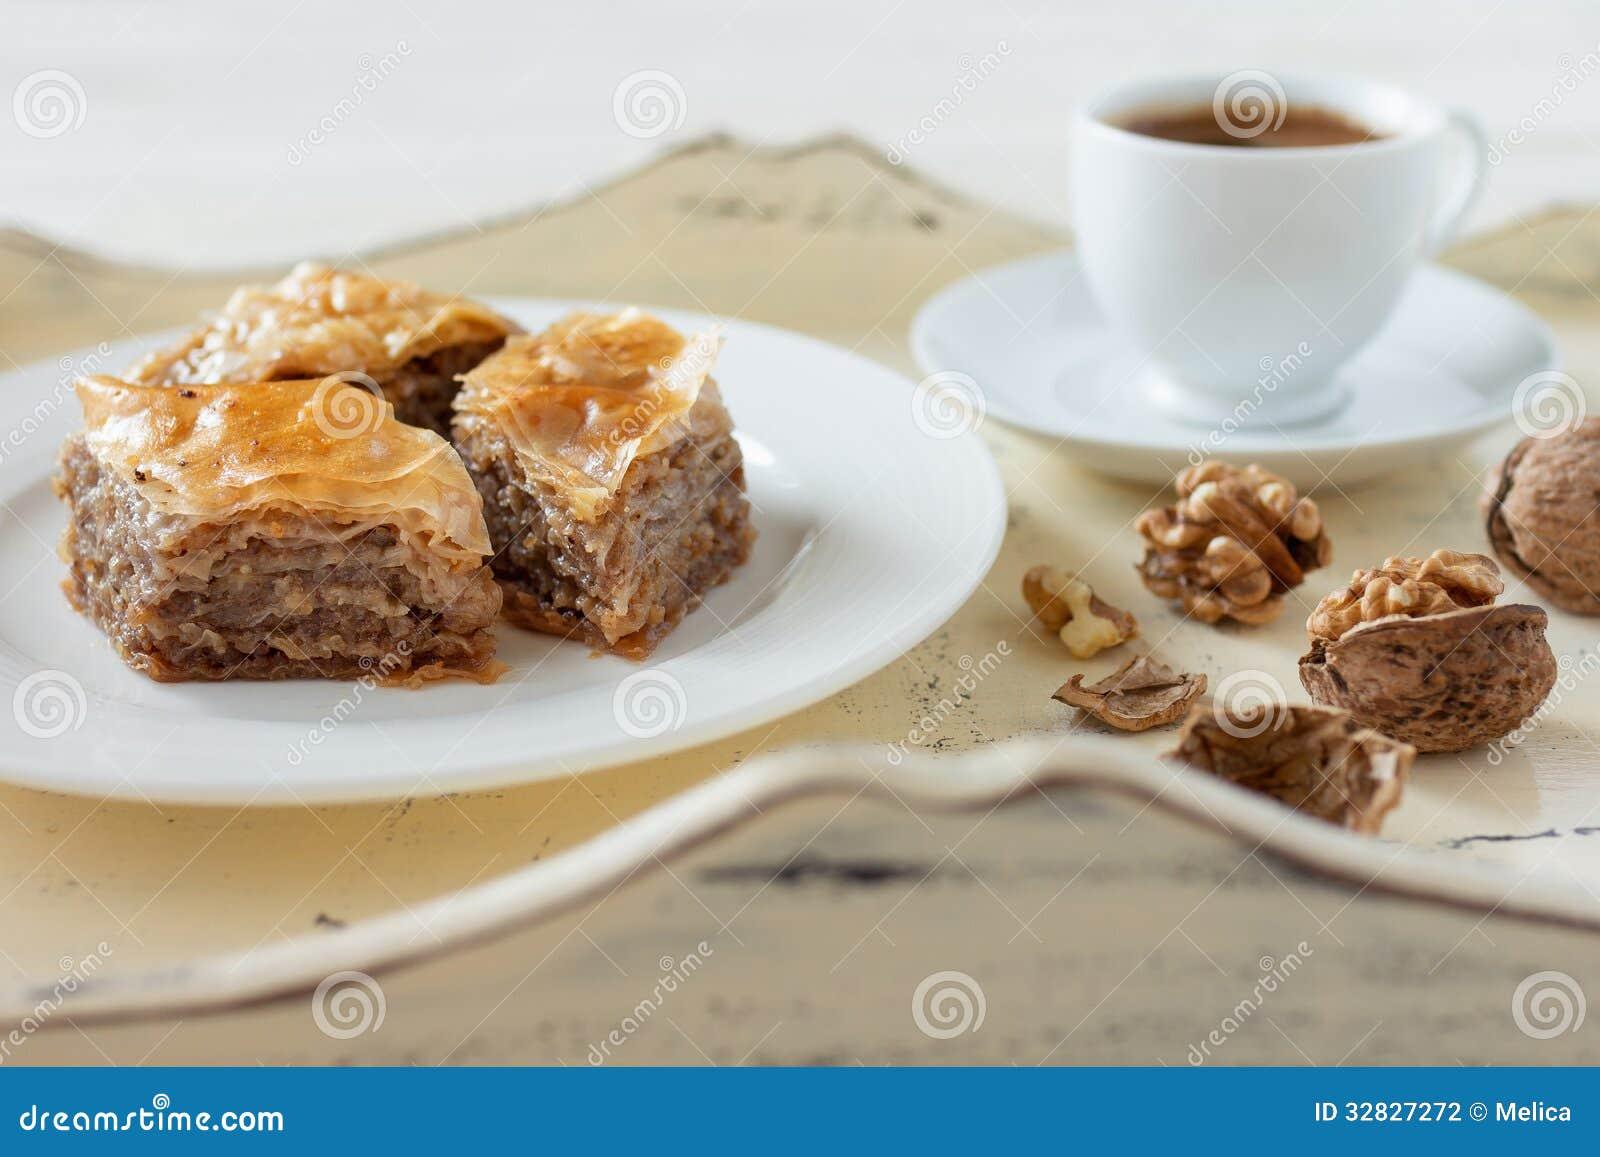 Golden Delight Bakery Cake Prices